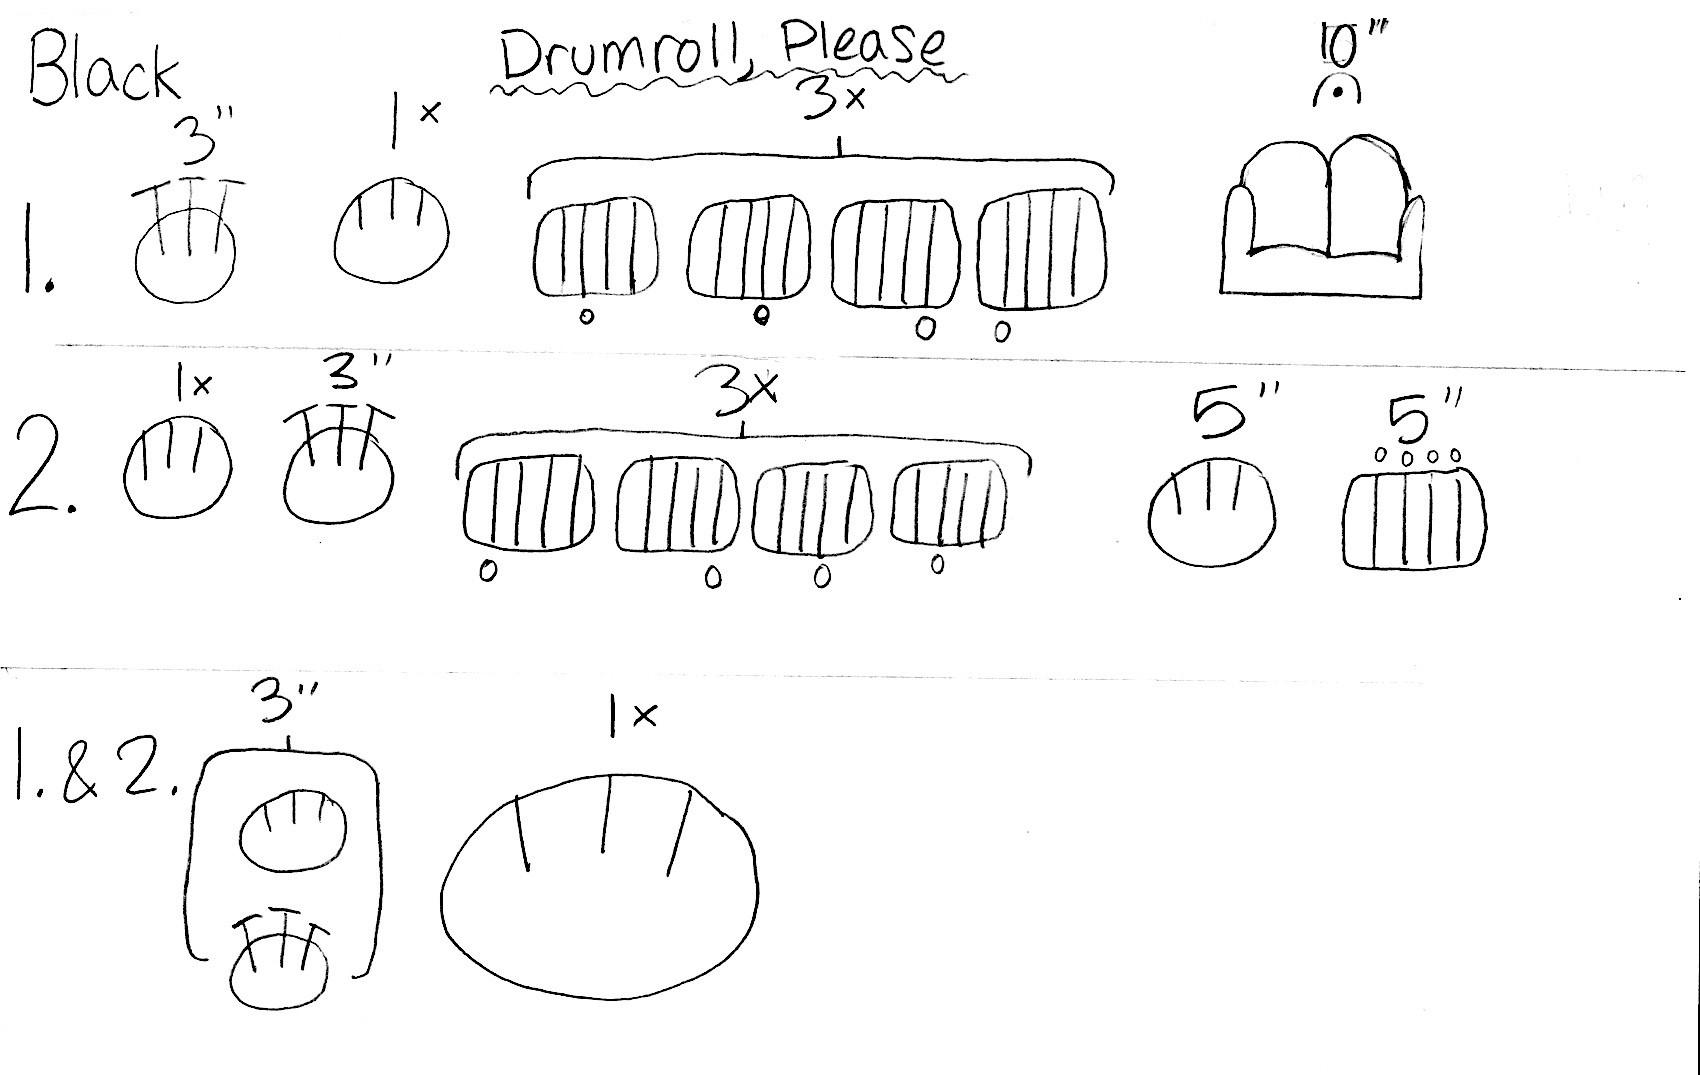 Drumroll Please (Black Level)